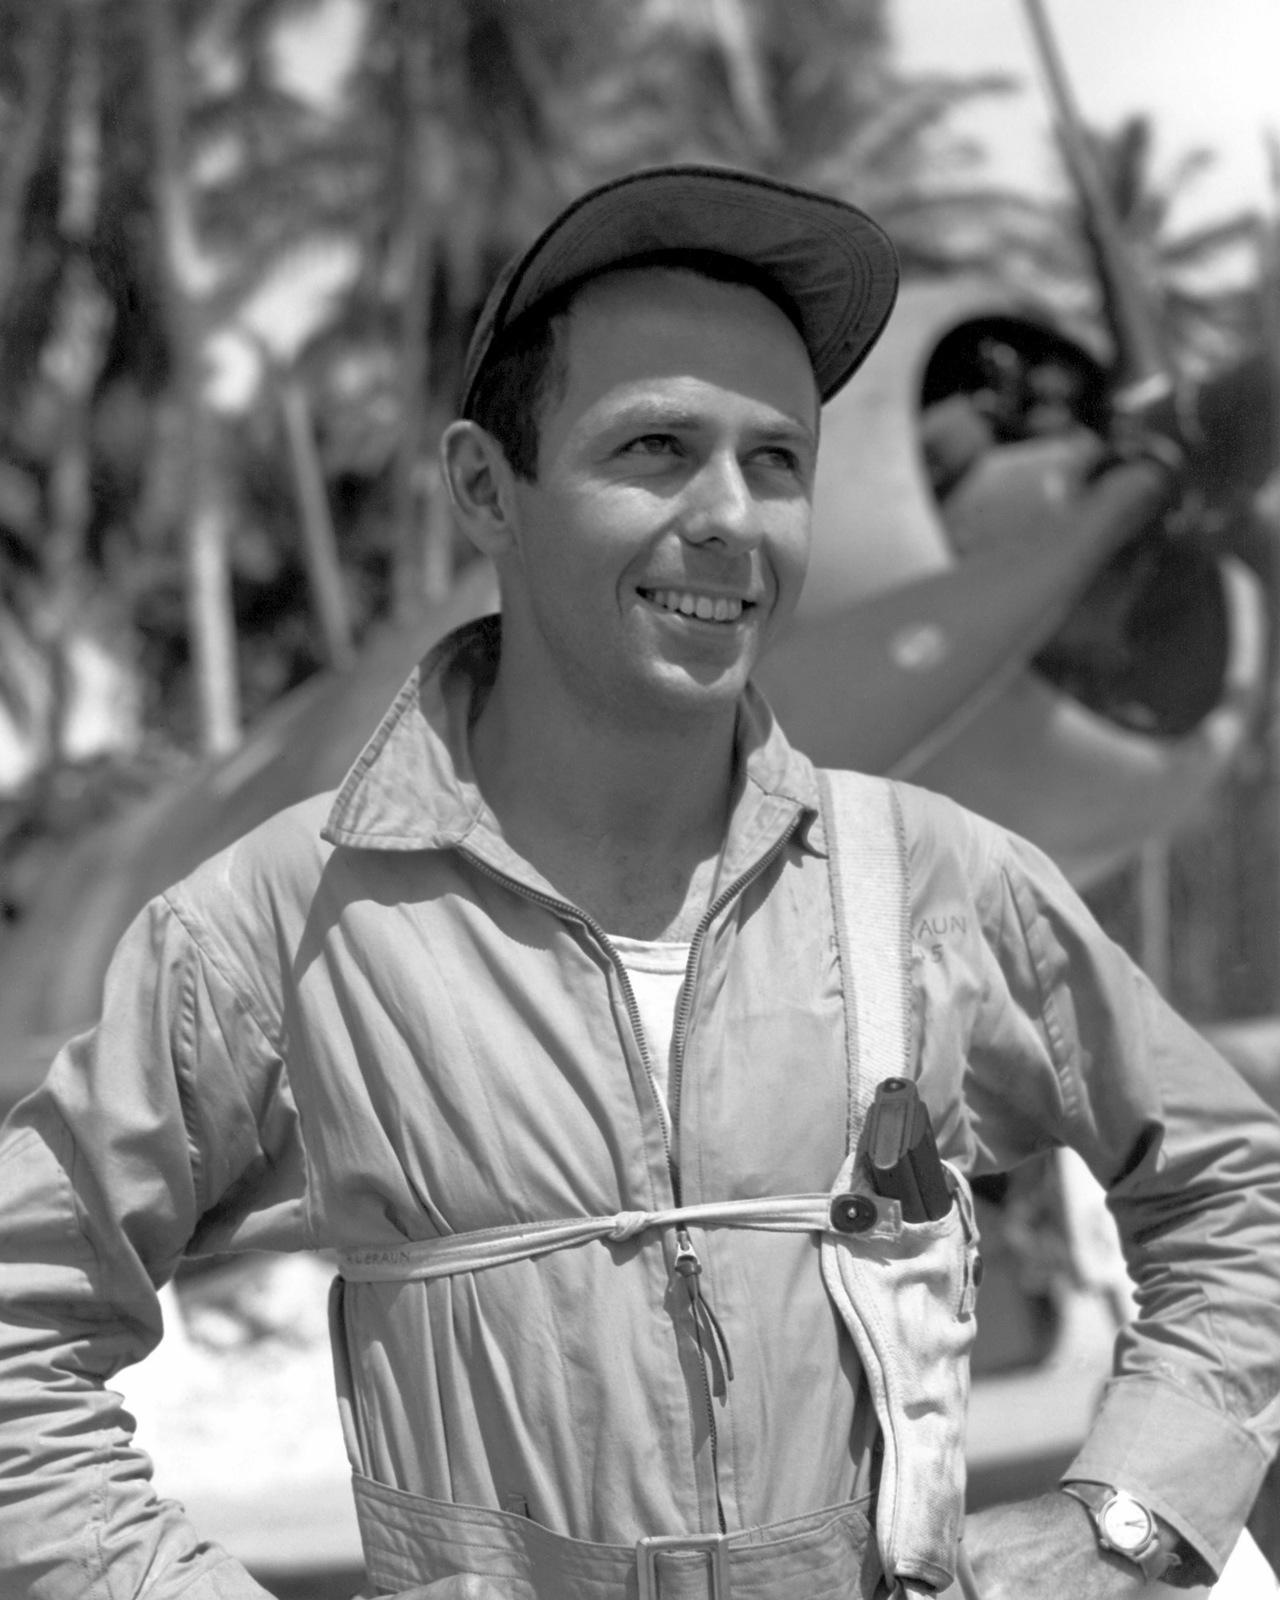 United States Marine Corps Captain (CPT) Richard L. Braun, from Santa Monica, California.  Official Portrait